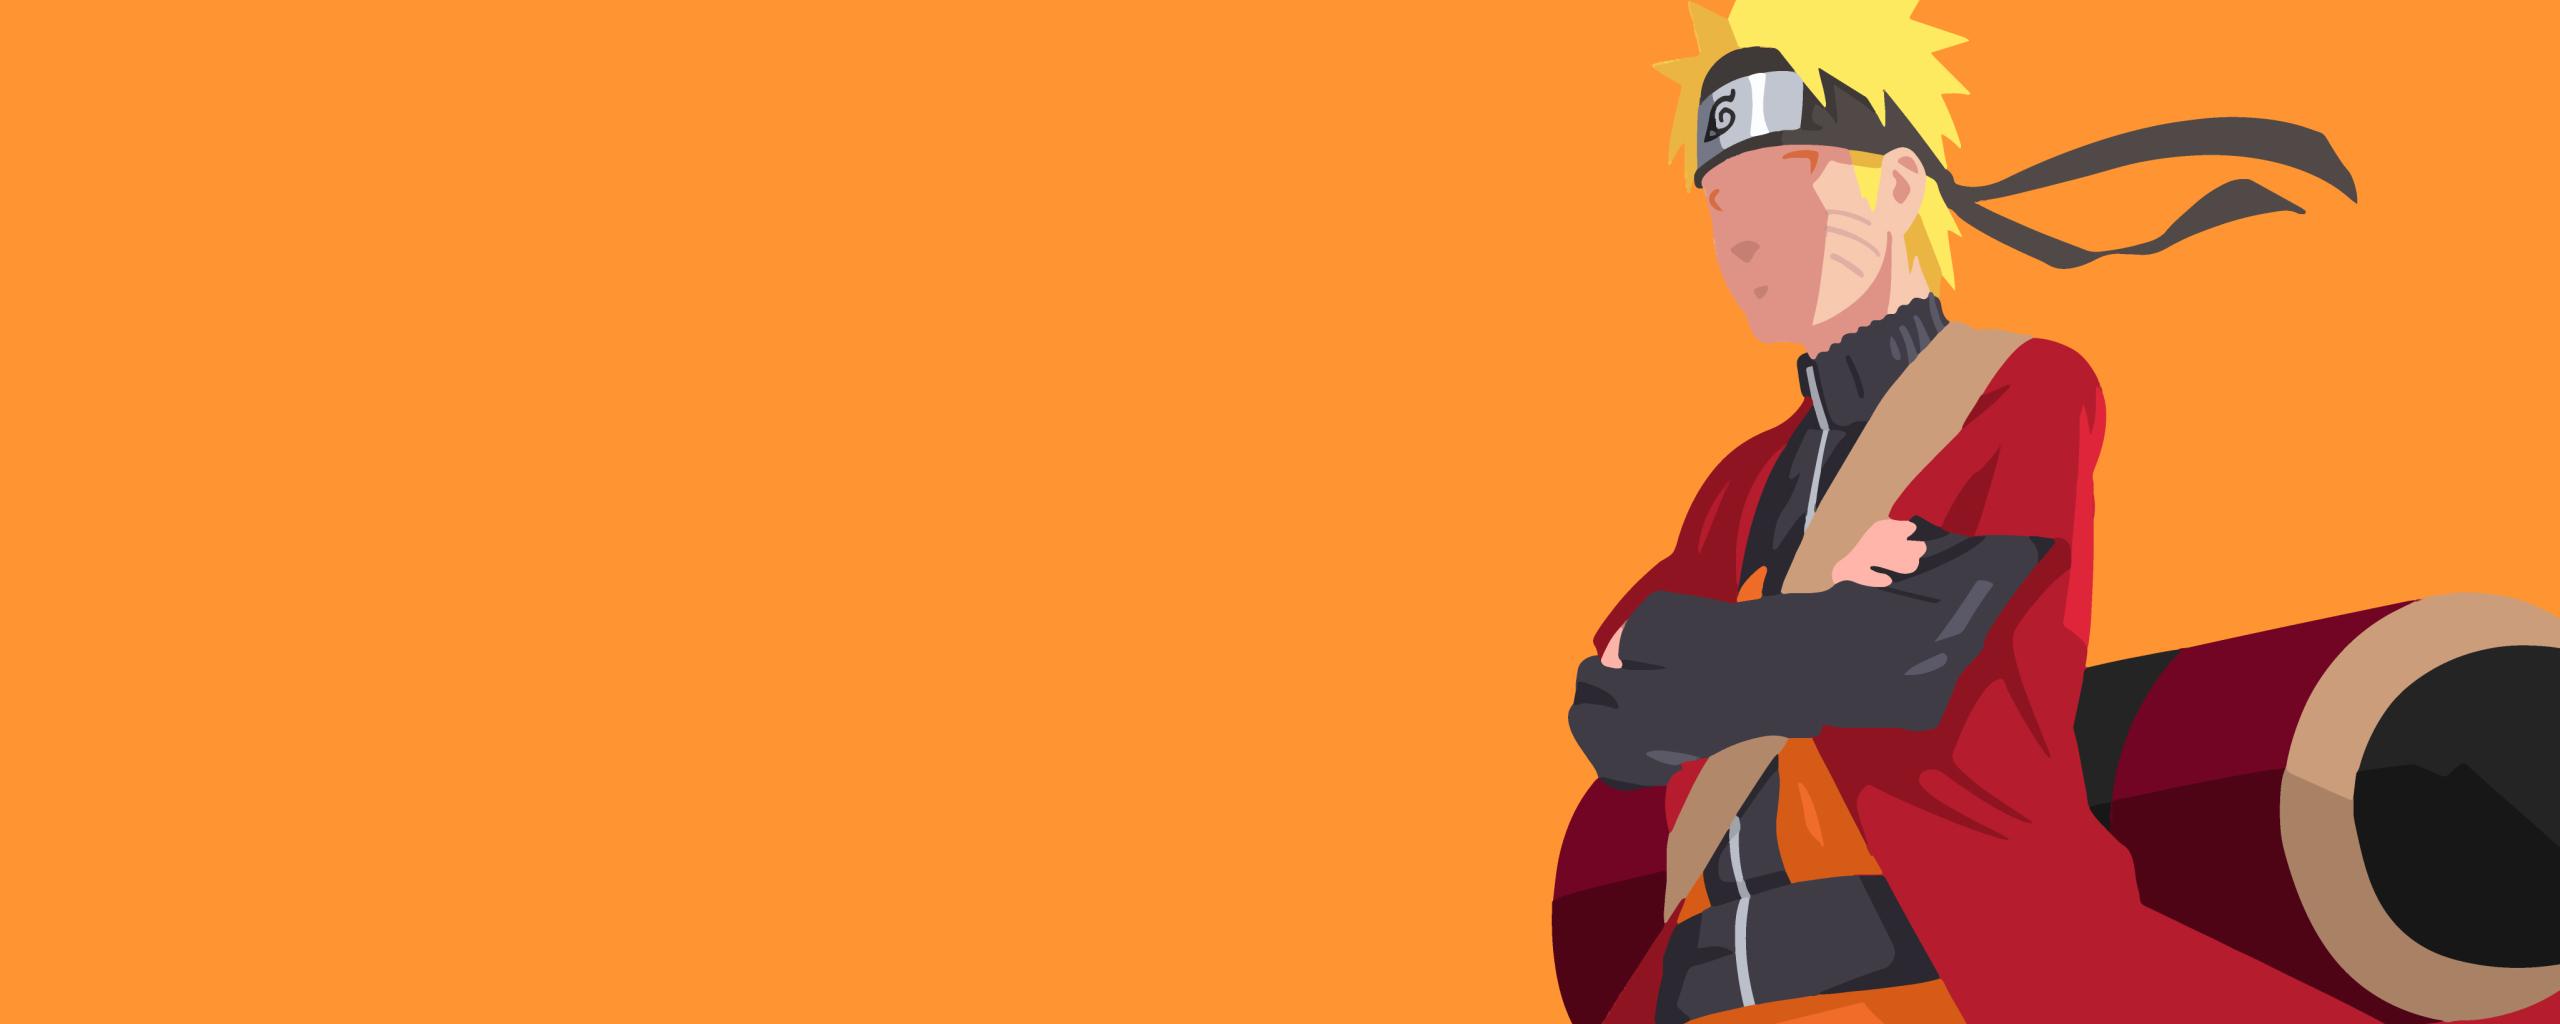 2560x1024 Hokage Naruto 4K 2560x1024 Resolution Wallpaper ...